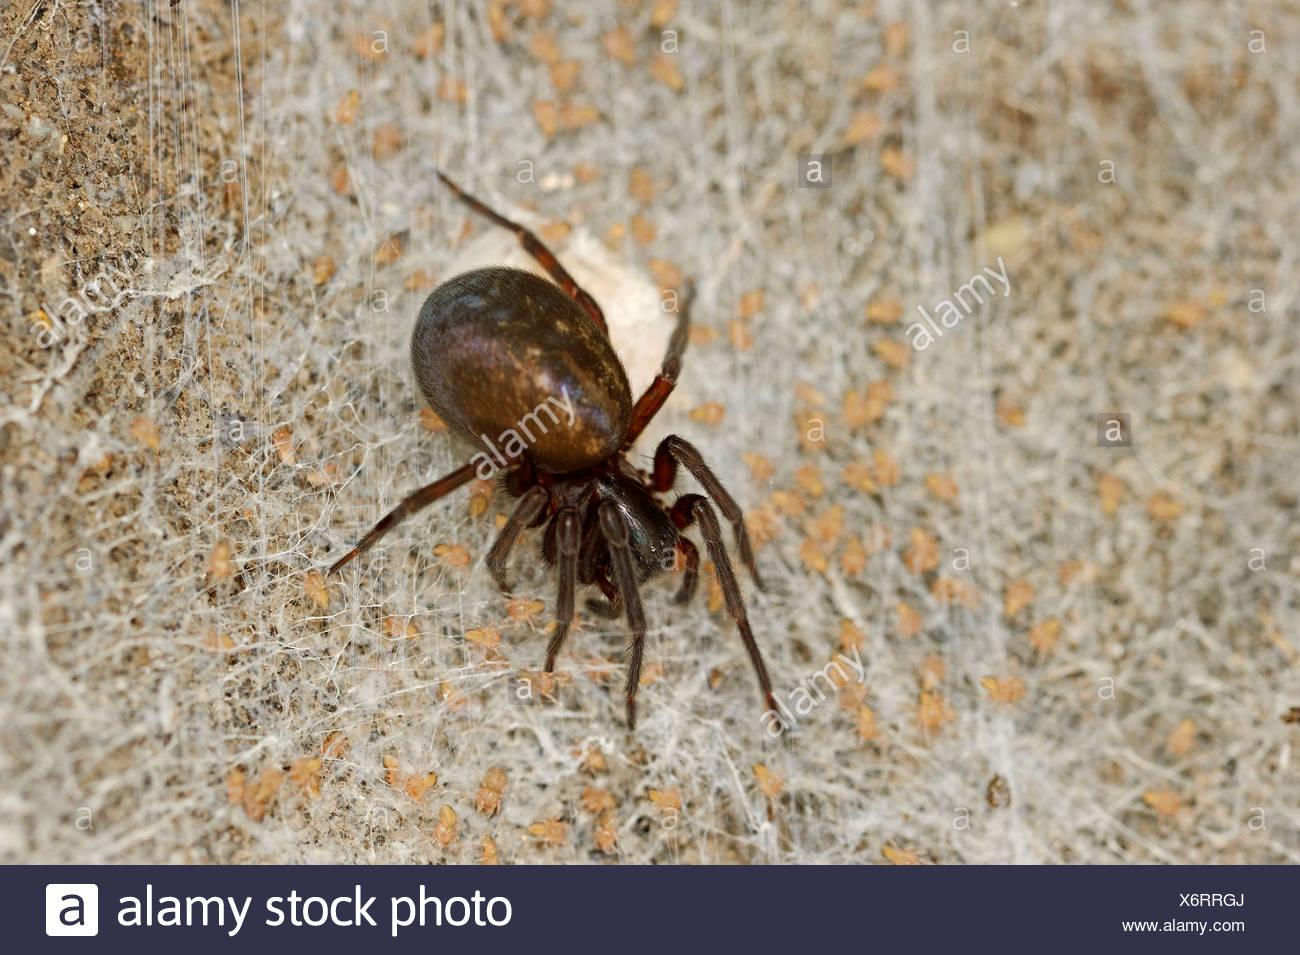 Black Lace Weaver Spider - Stock Image